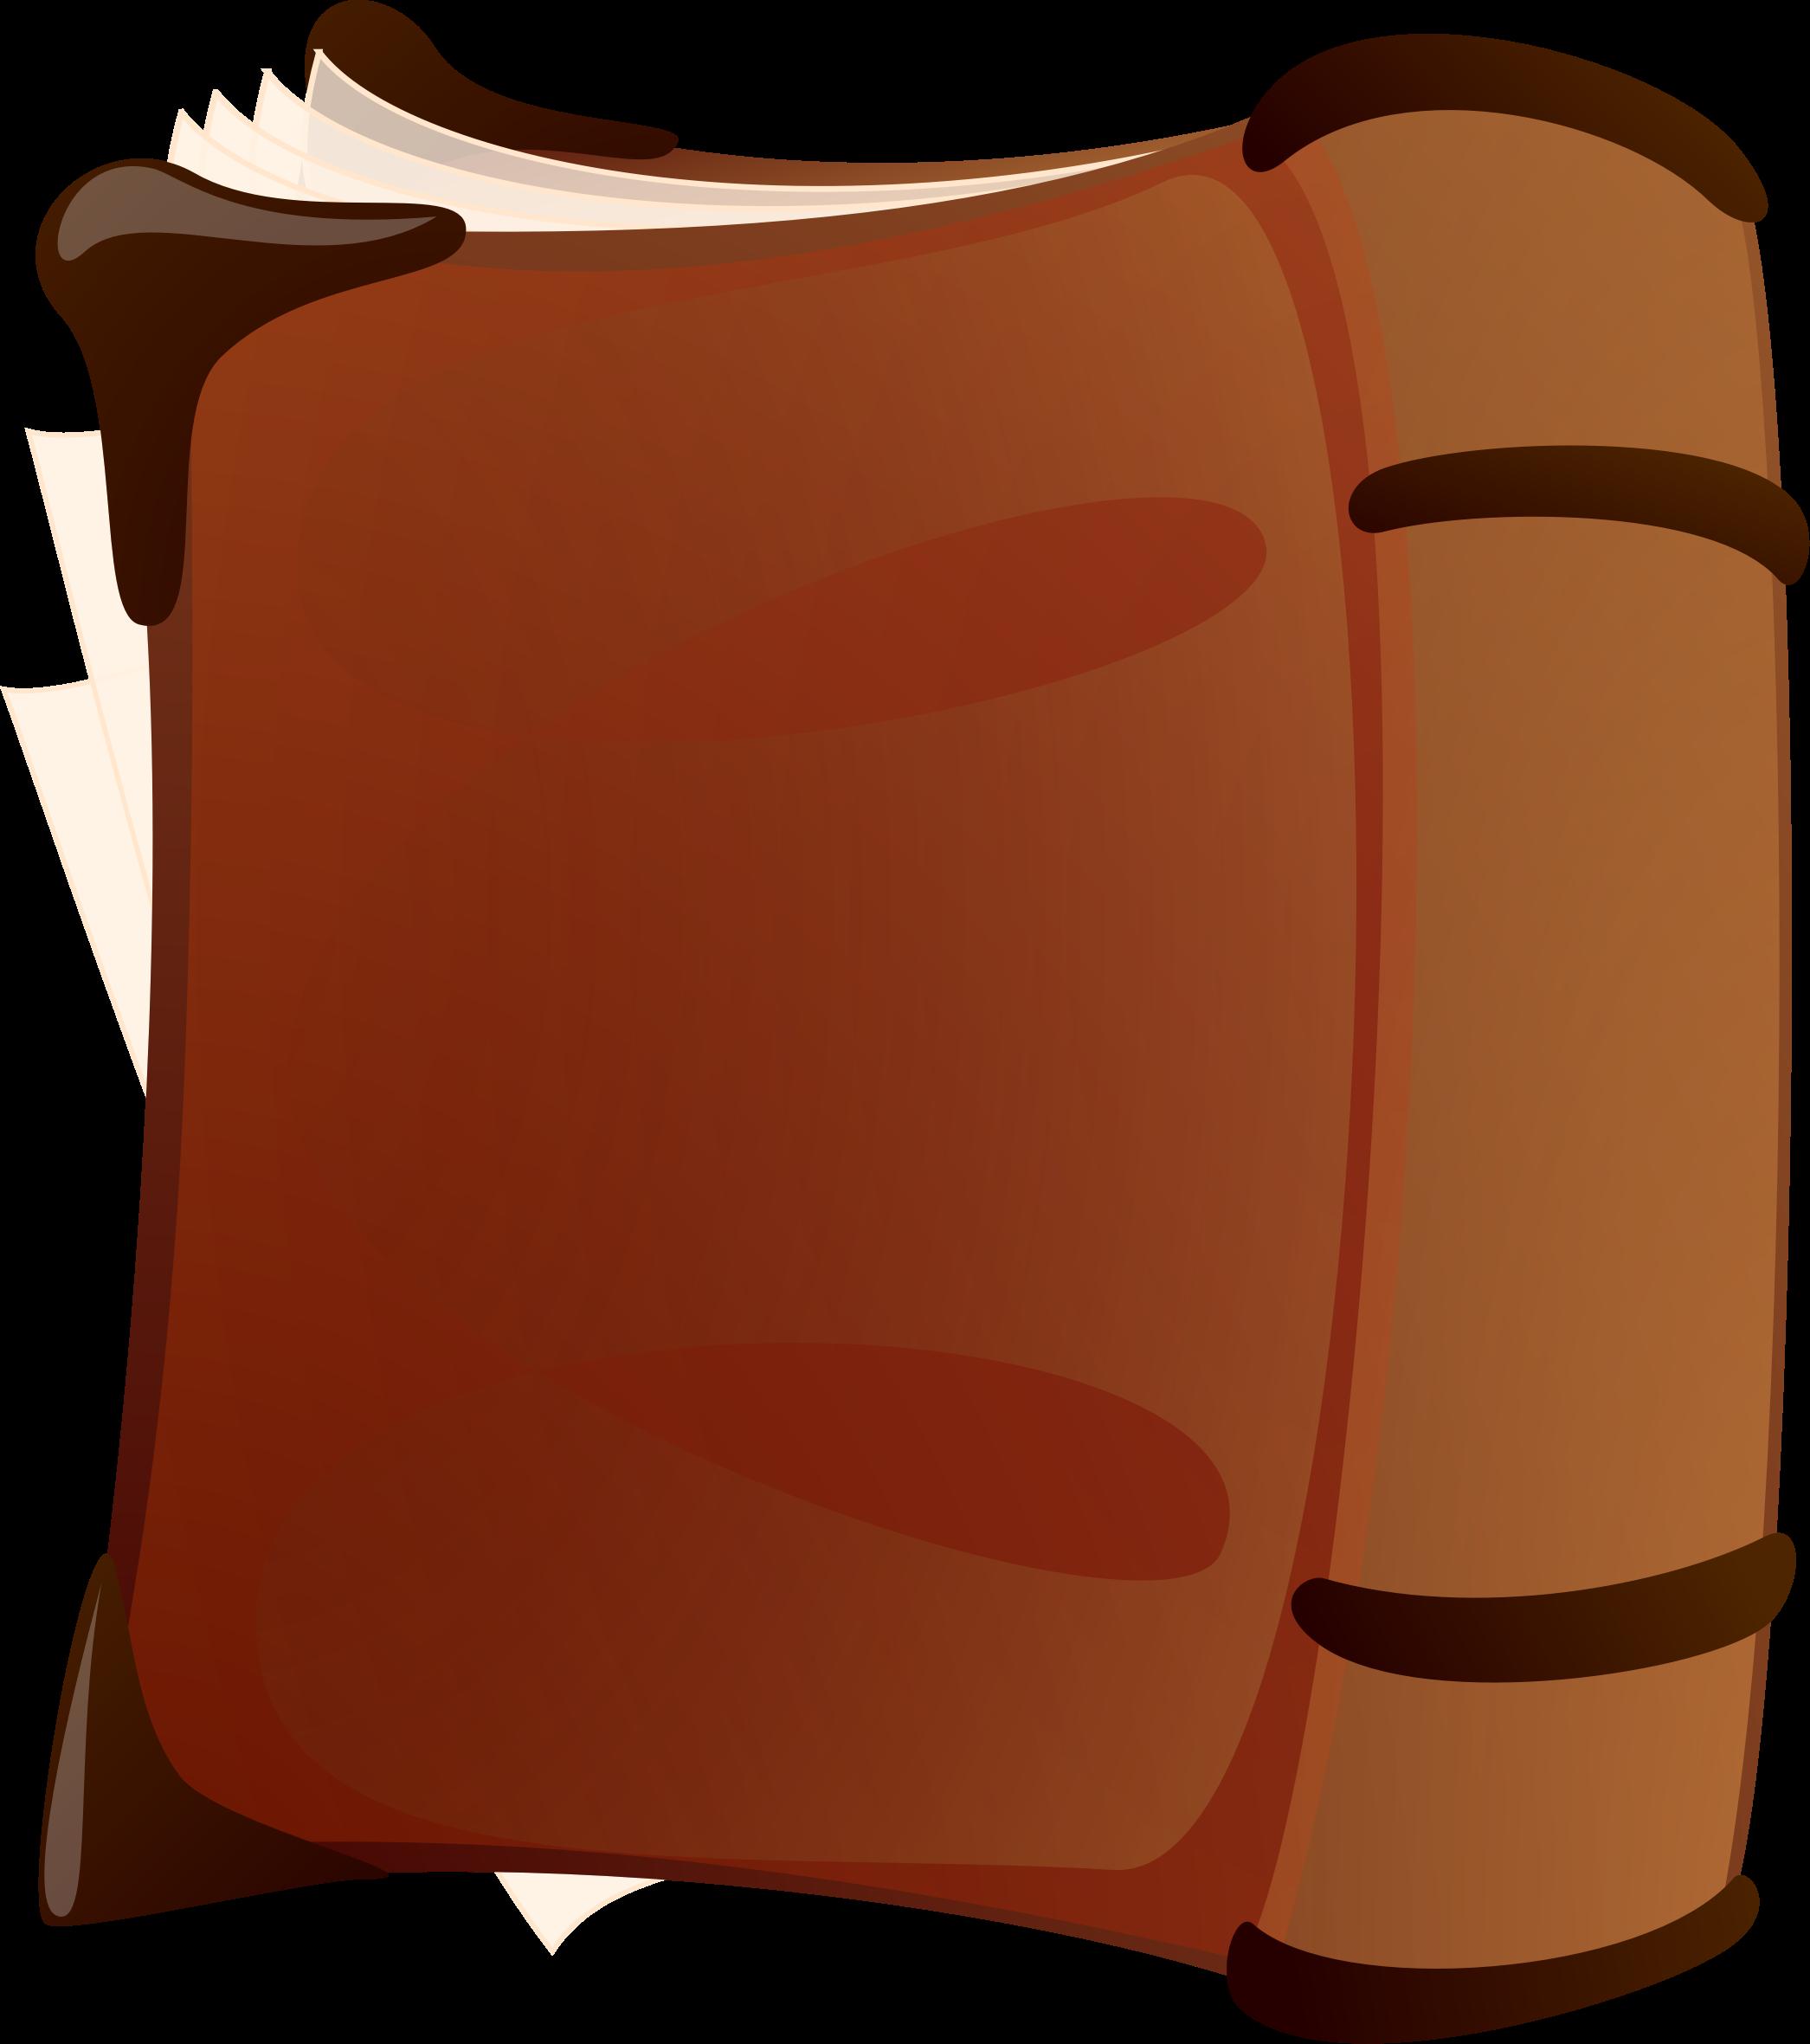 Orange book clipart clip art library download Clipart - old book clip art library download